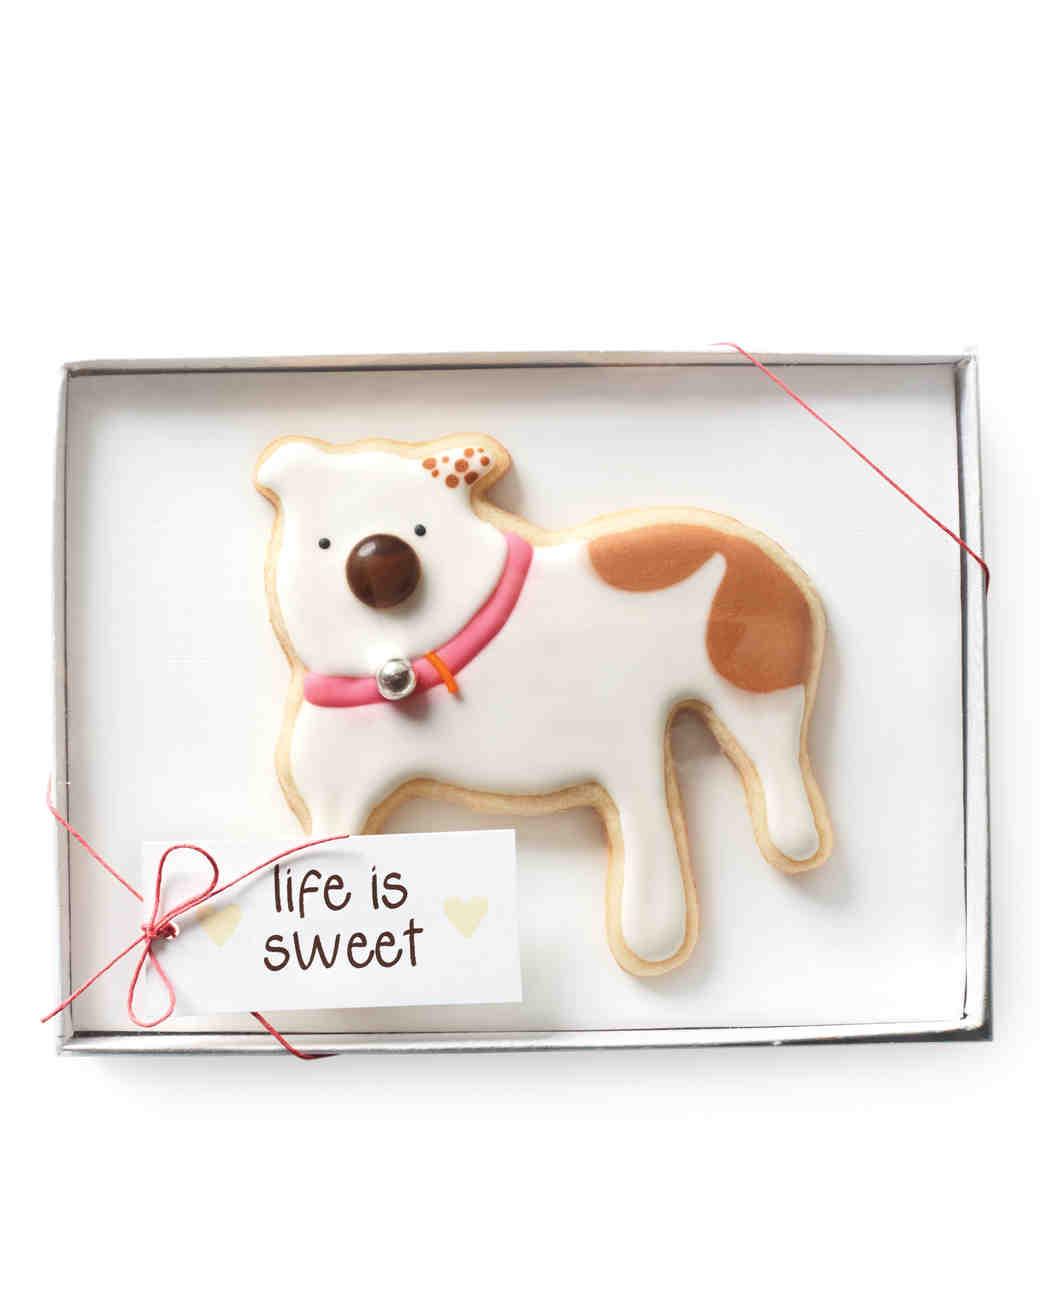 dog-cookie-092-mwd110687.jpg